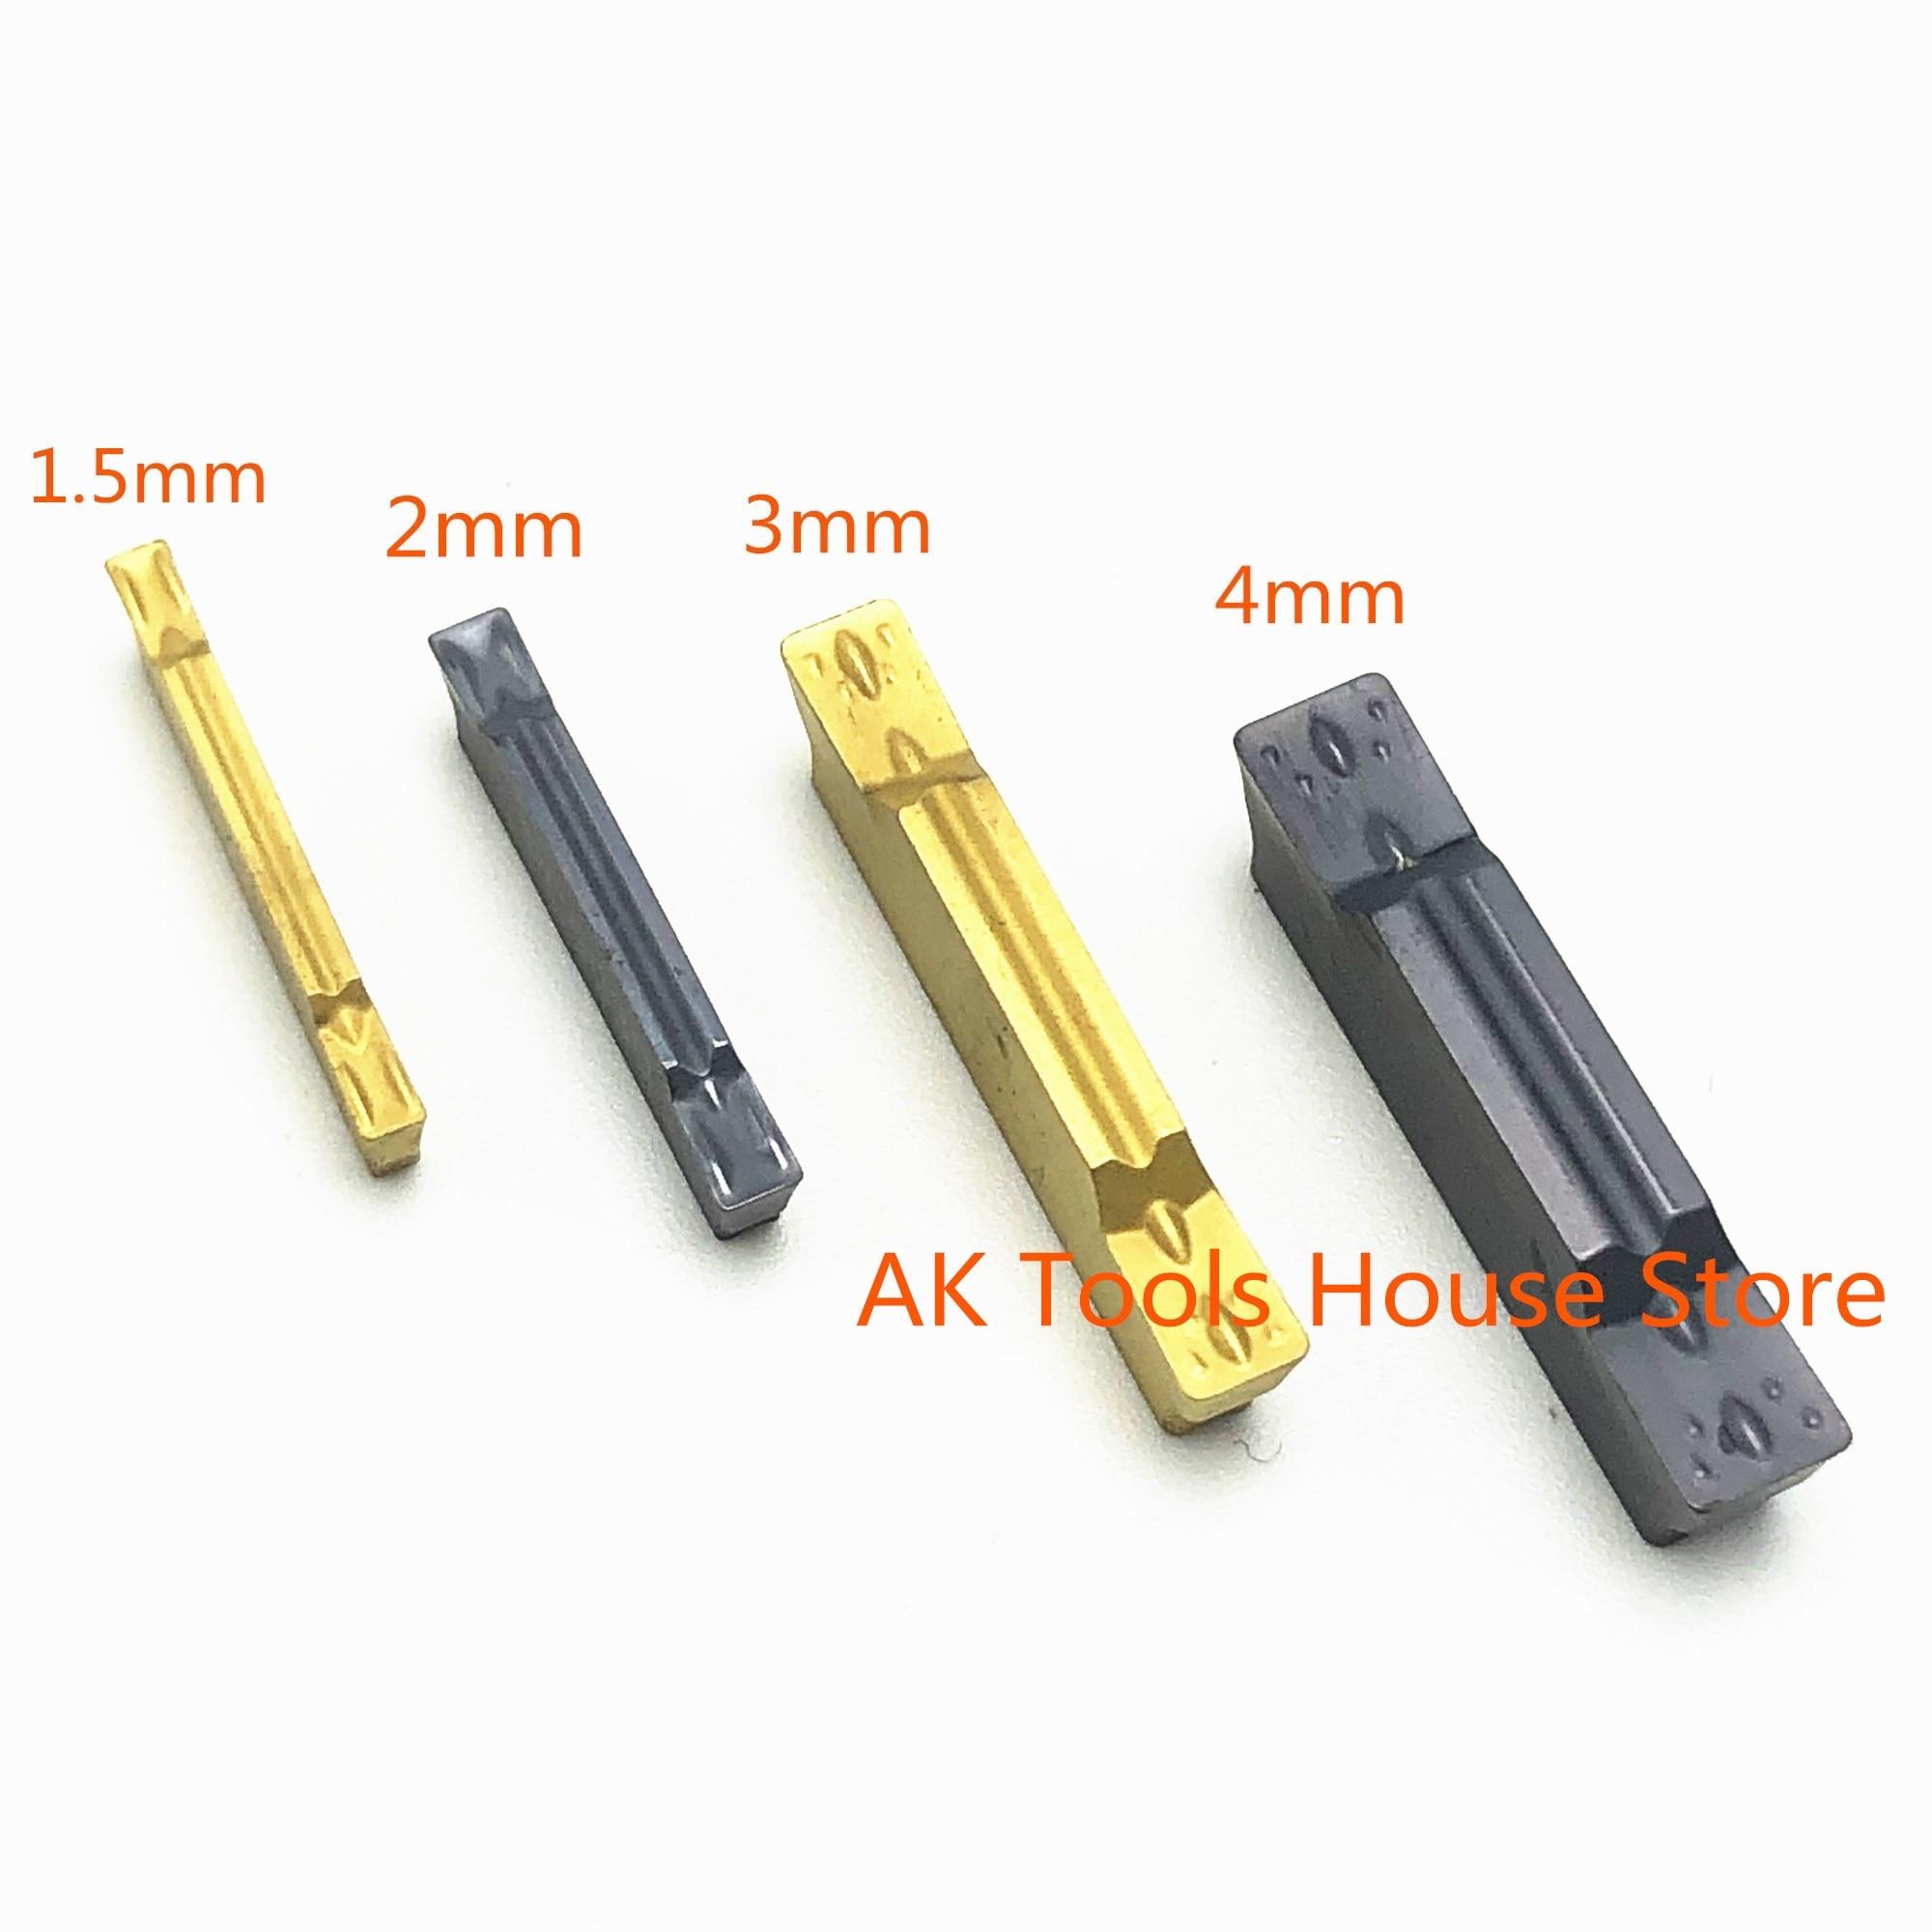 Купить с кэшбэком 10PCS grooving tool MGMN150 MGMN200 MGMN300 MGMN400 NC3020 NC3030 PC9030 slotted and slotted carbide metal turning lathe tools